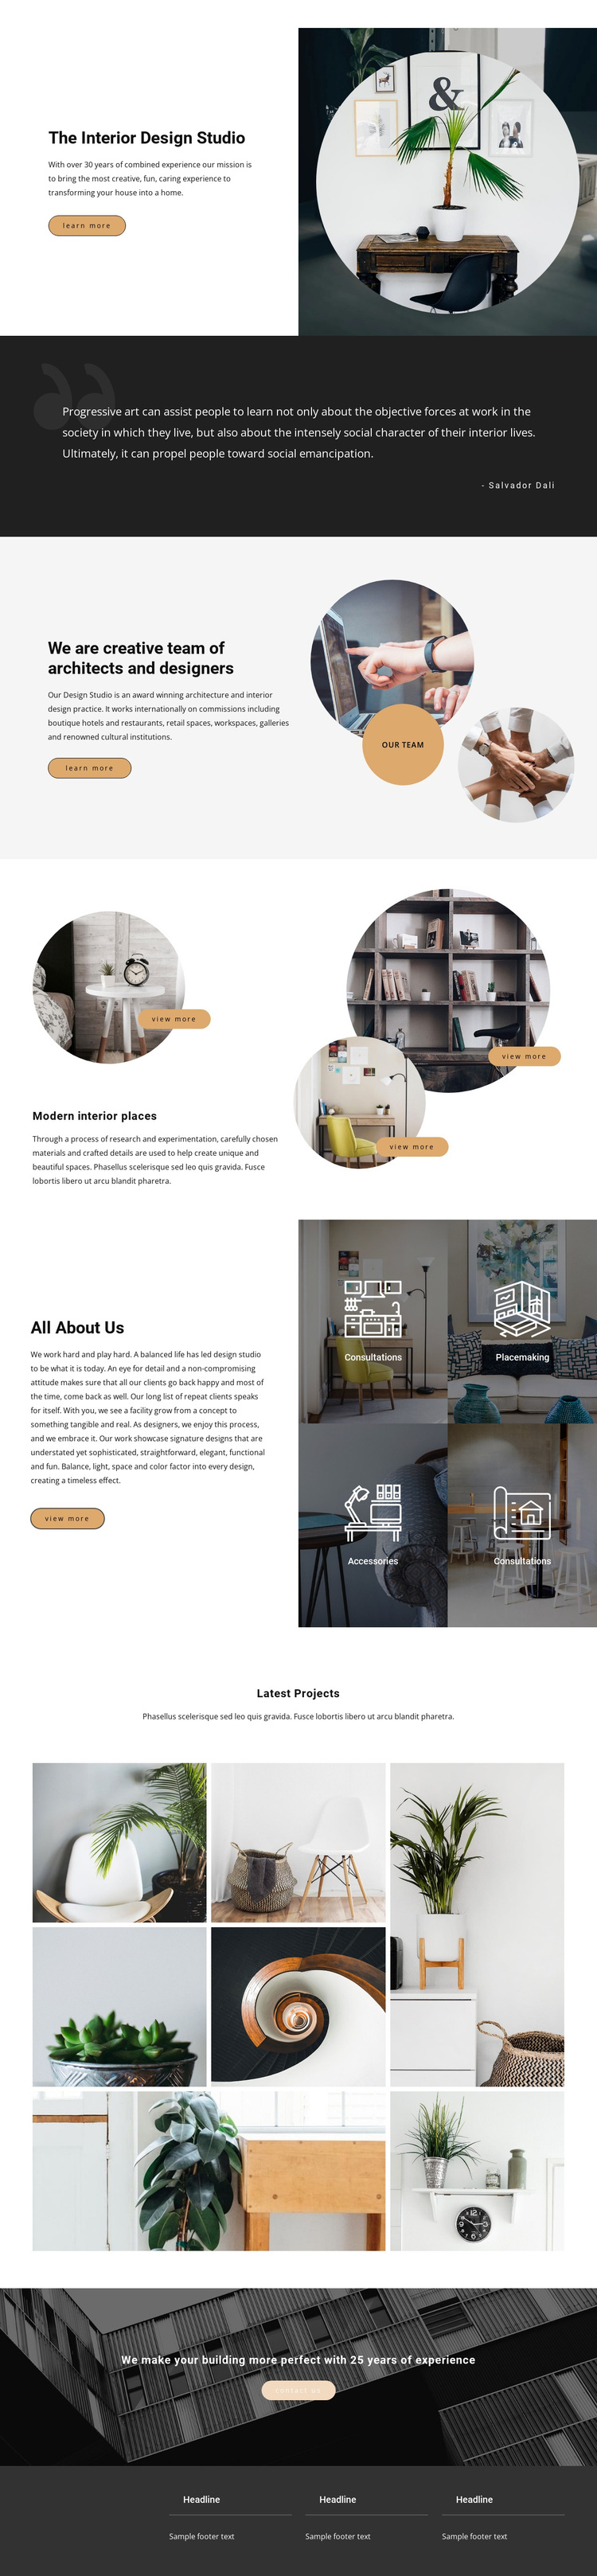 Interior innovations Joomla Page Builder